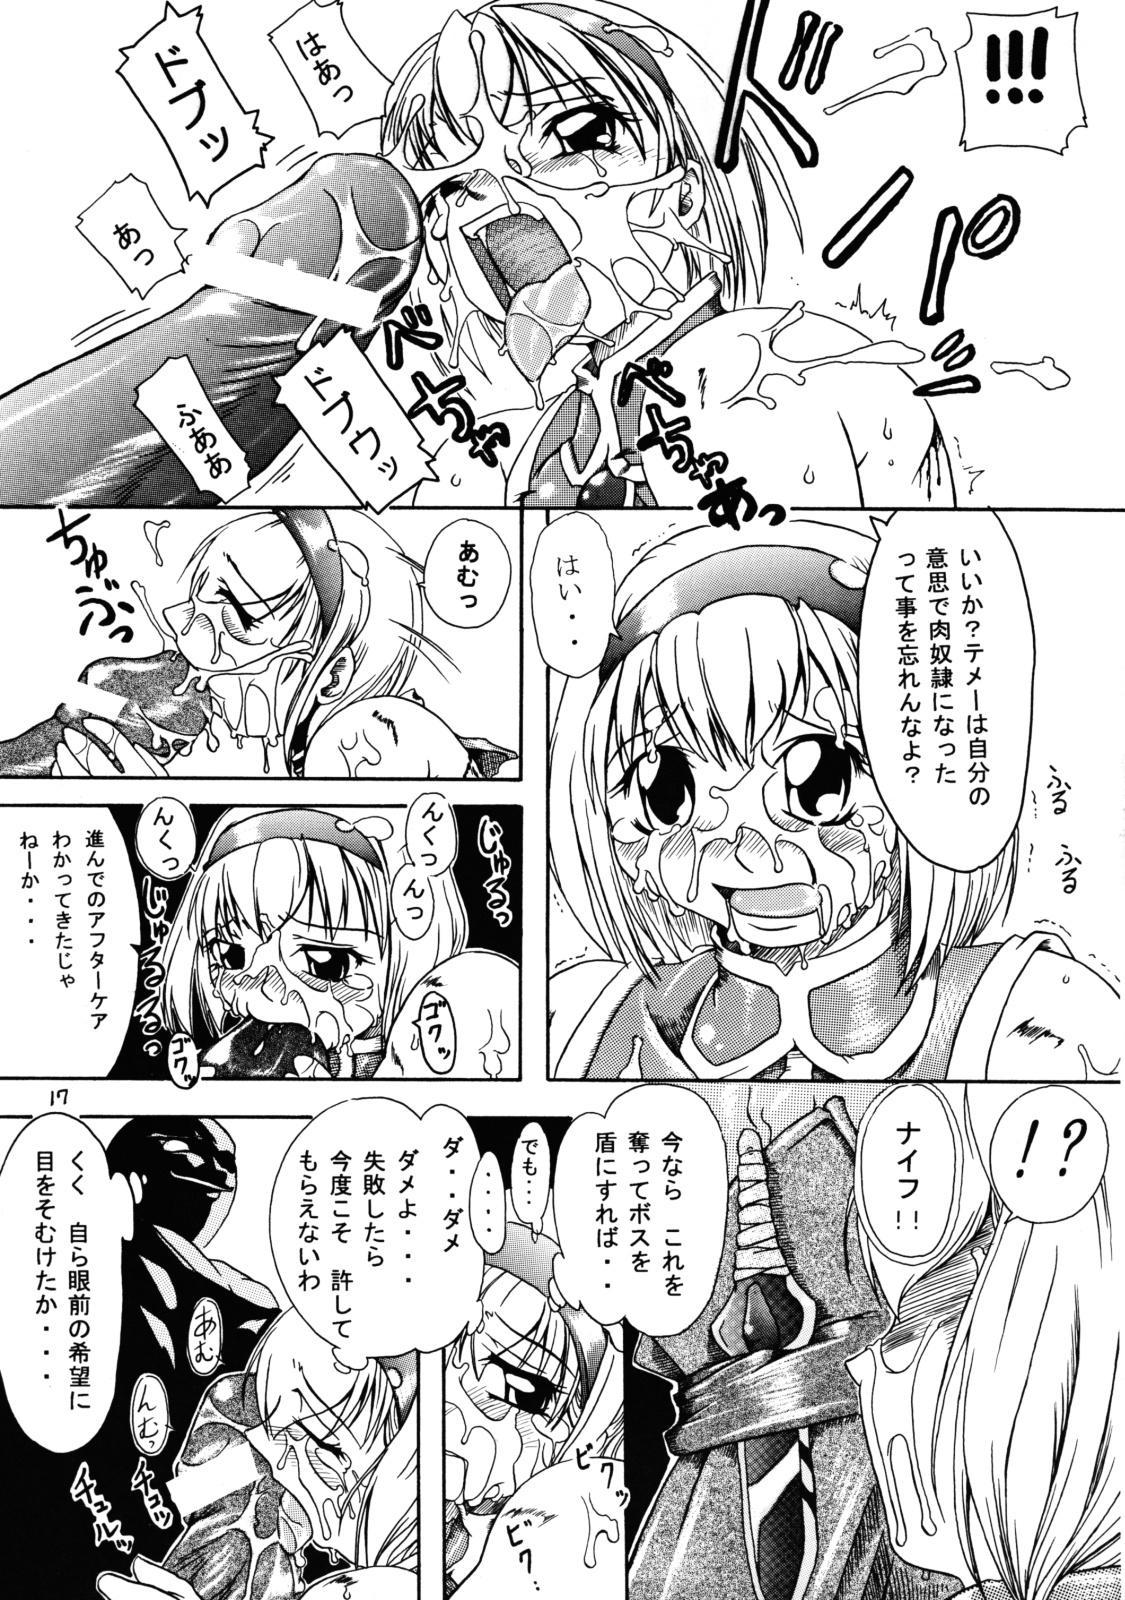 Kakugee Sanmai 3 15